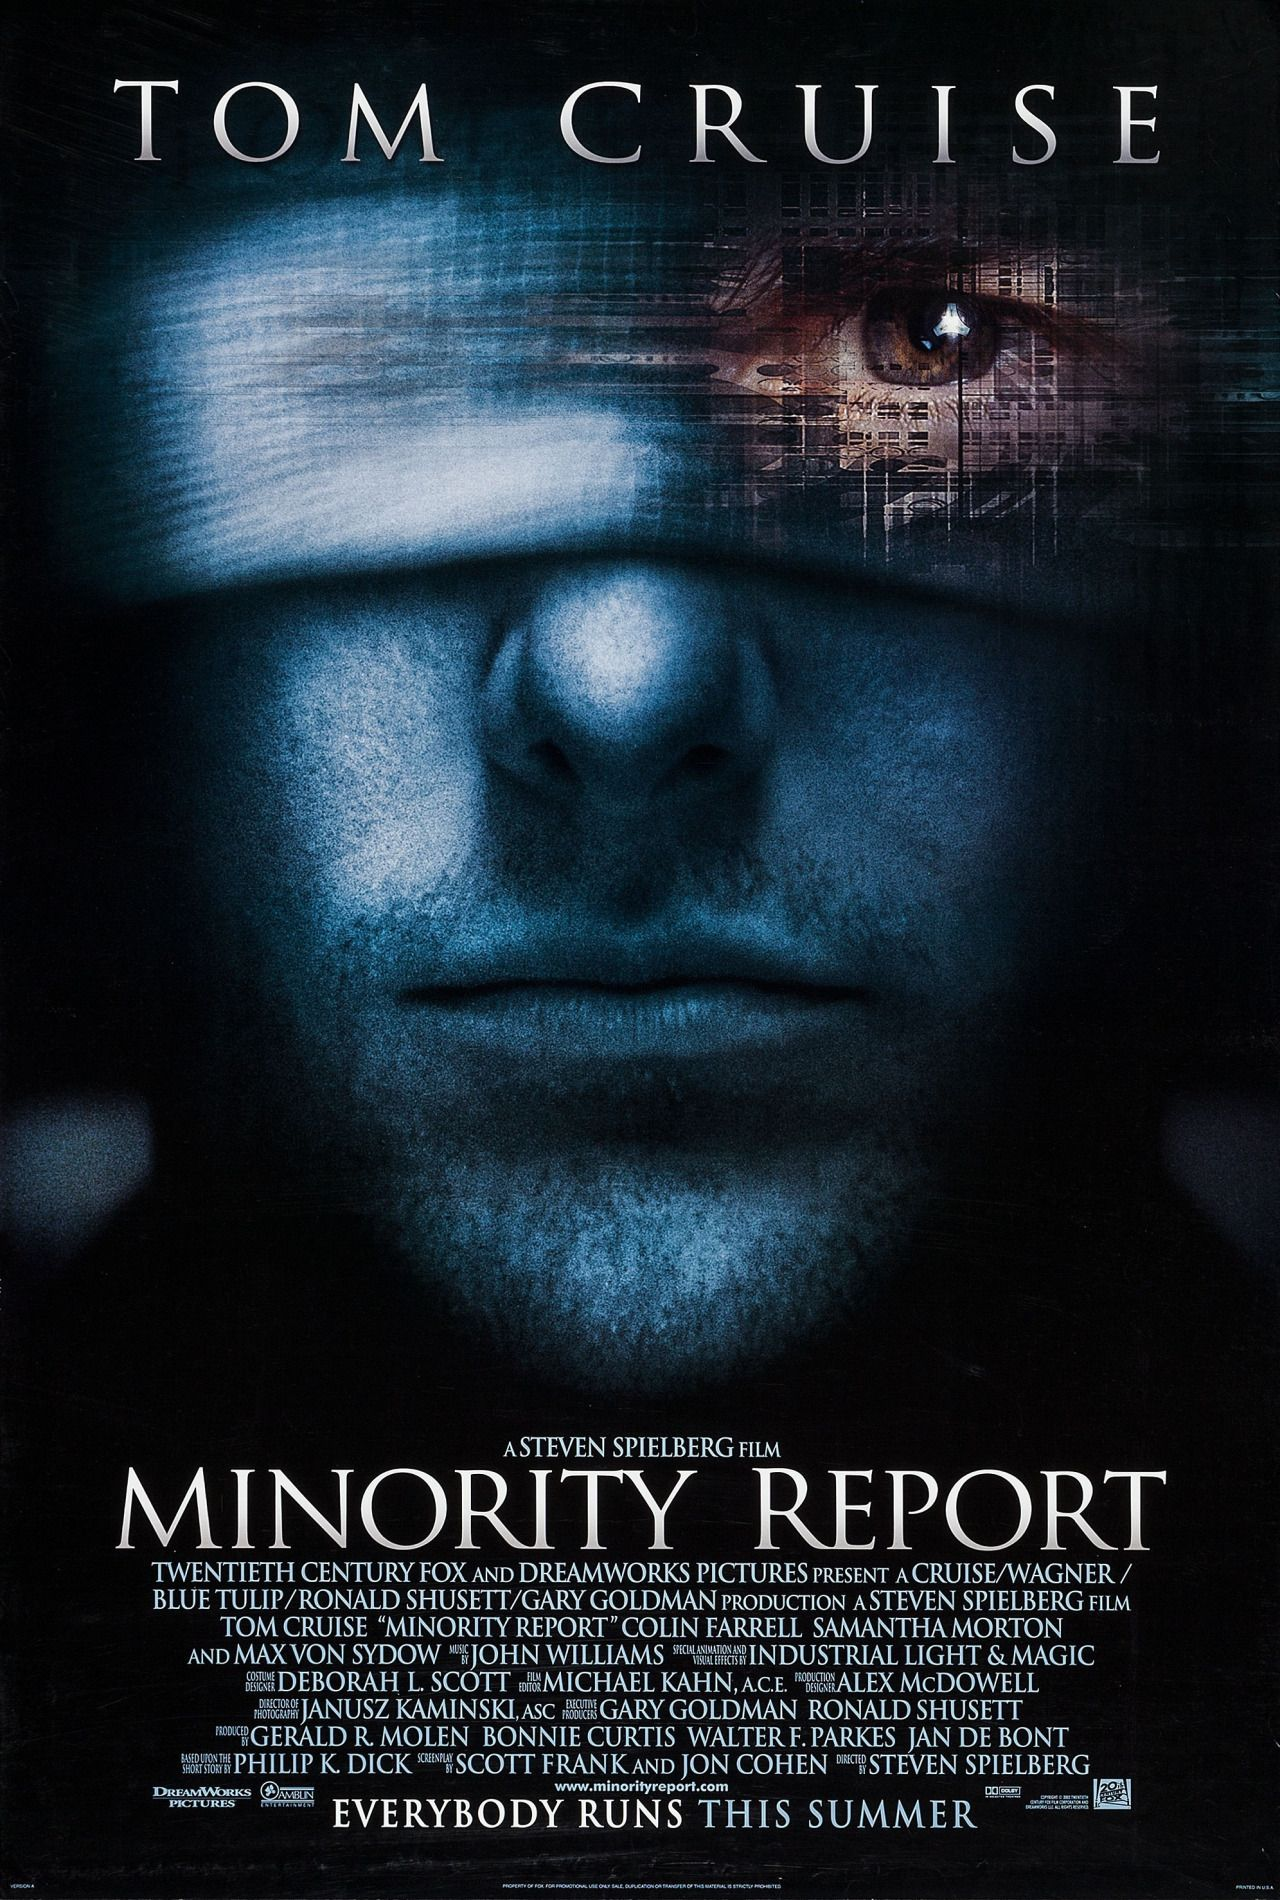 Minority Report De Steven Spielberg 2002 Tom Cruise Cine Fantastico Cine